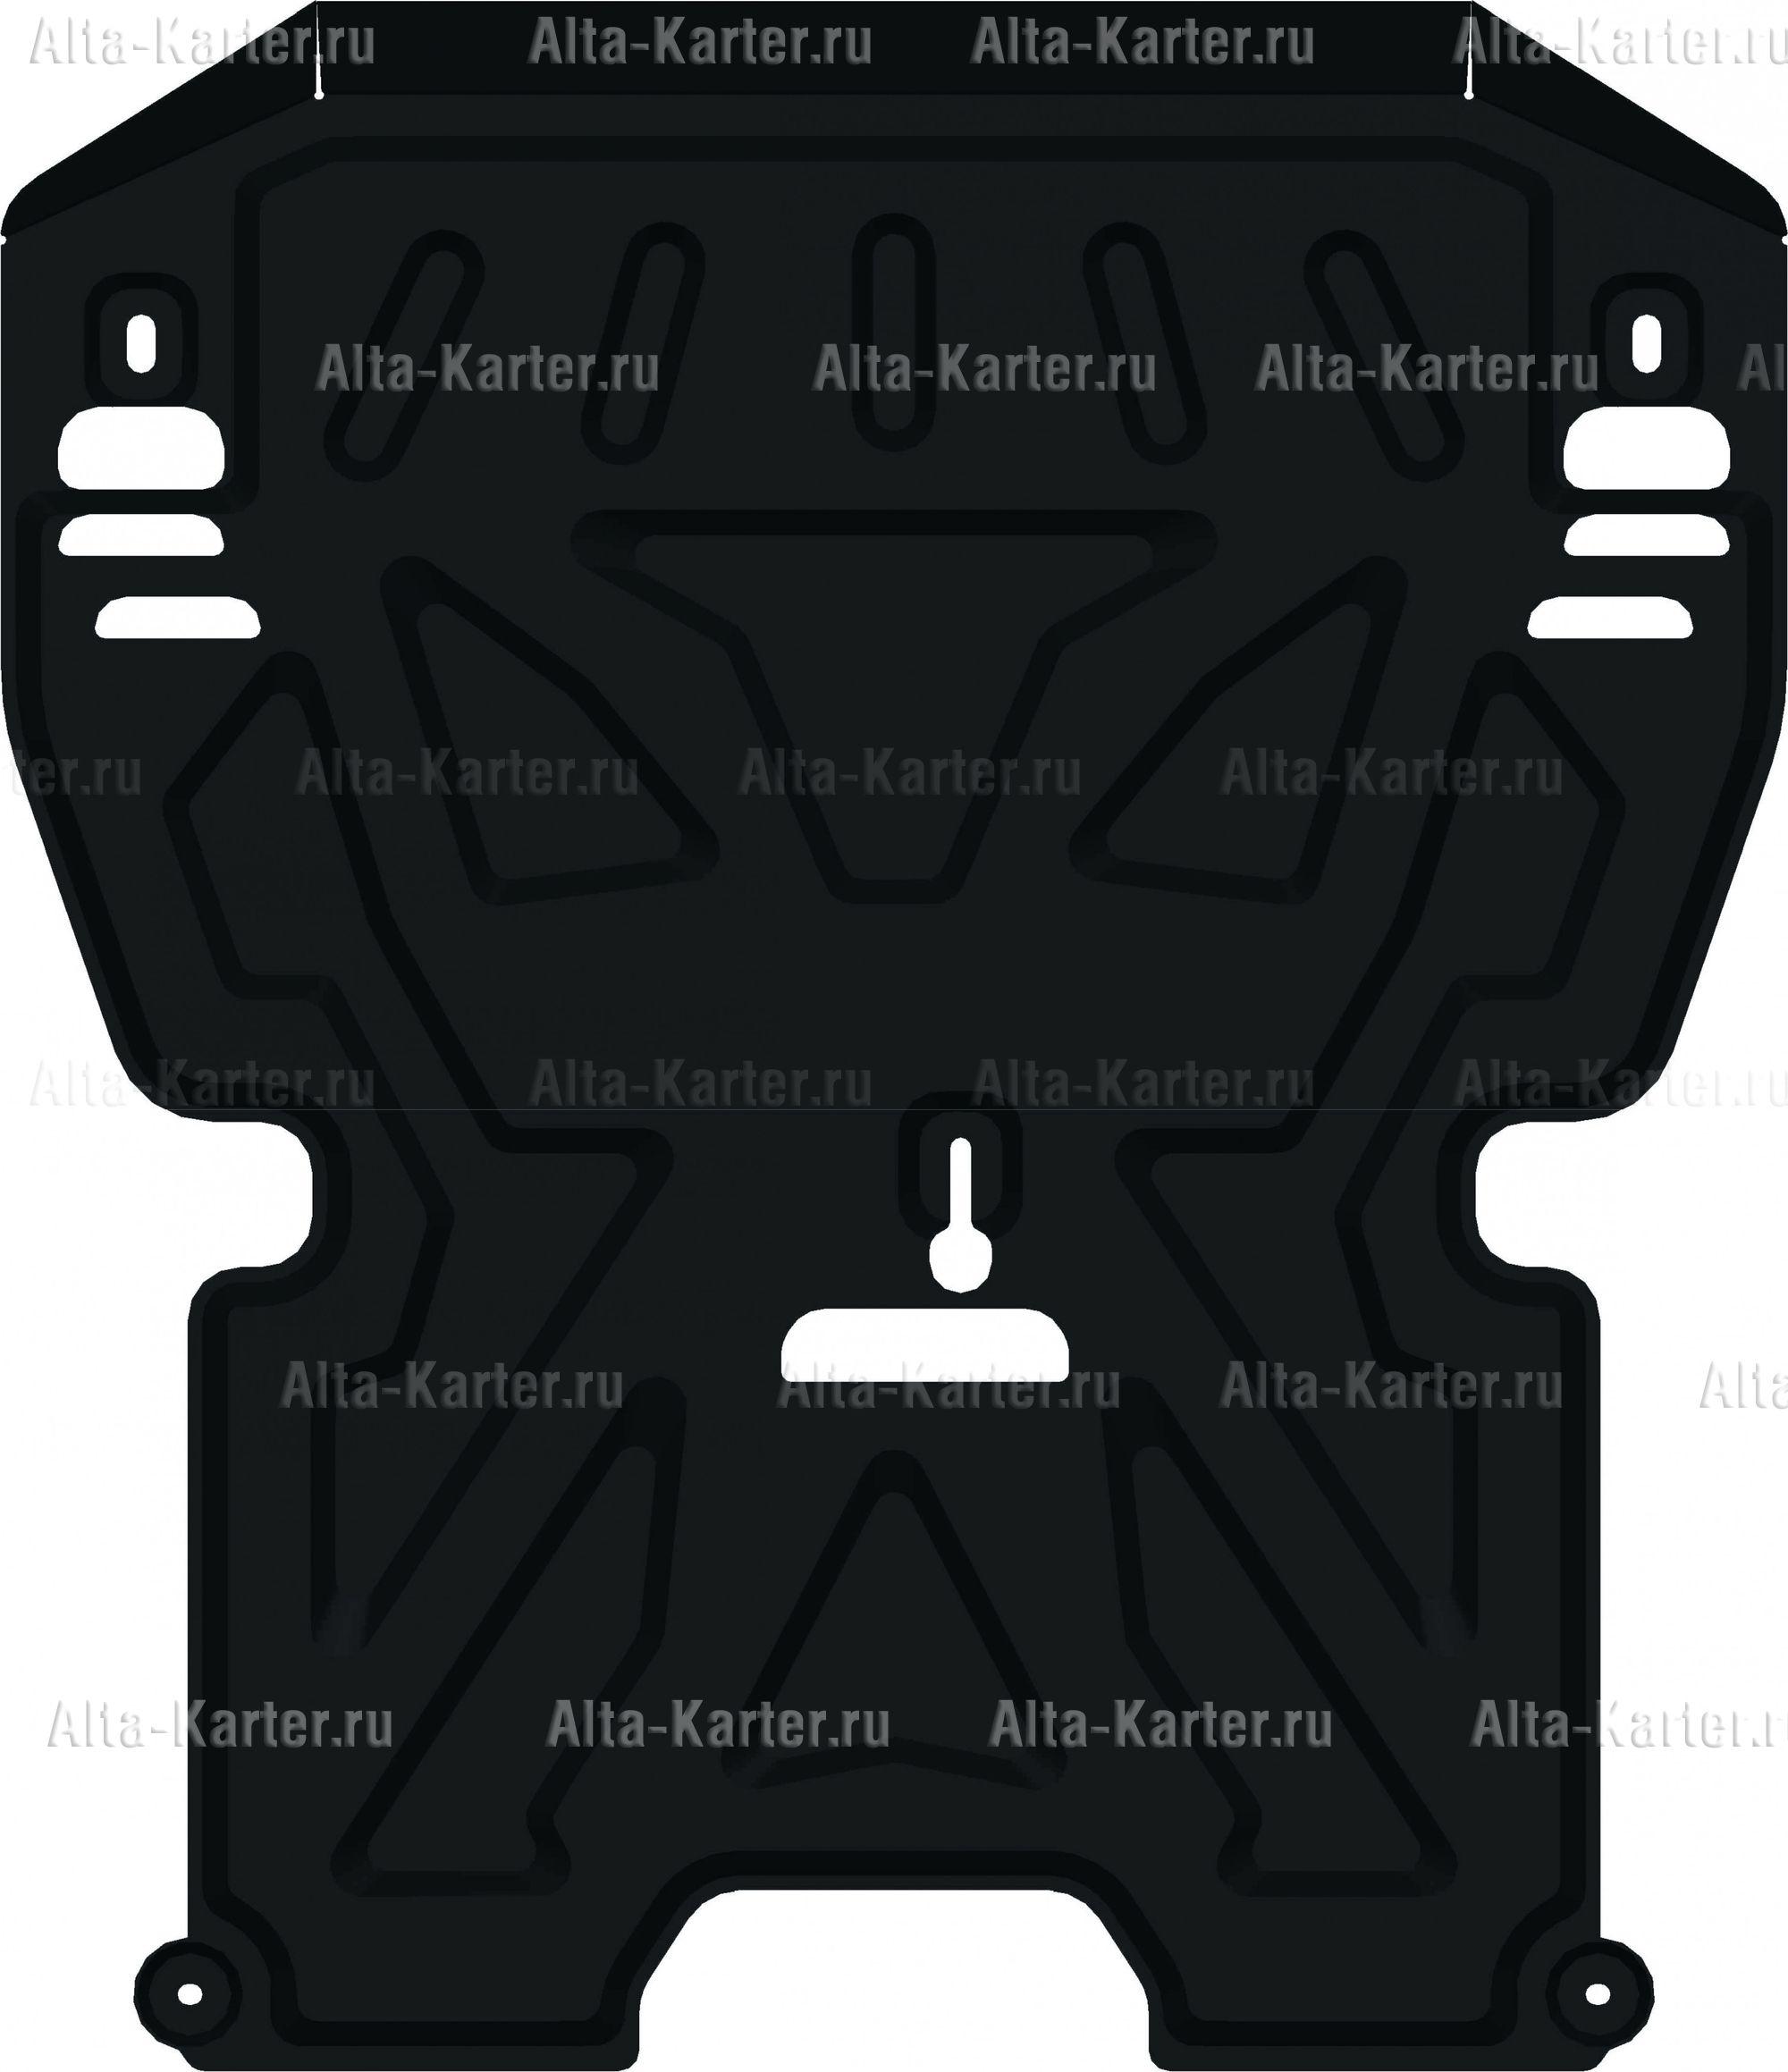 Защита Alfeco для картера и КПП Porsche Macan 2014-2021. Артикул ALF.50.04